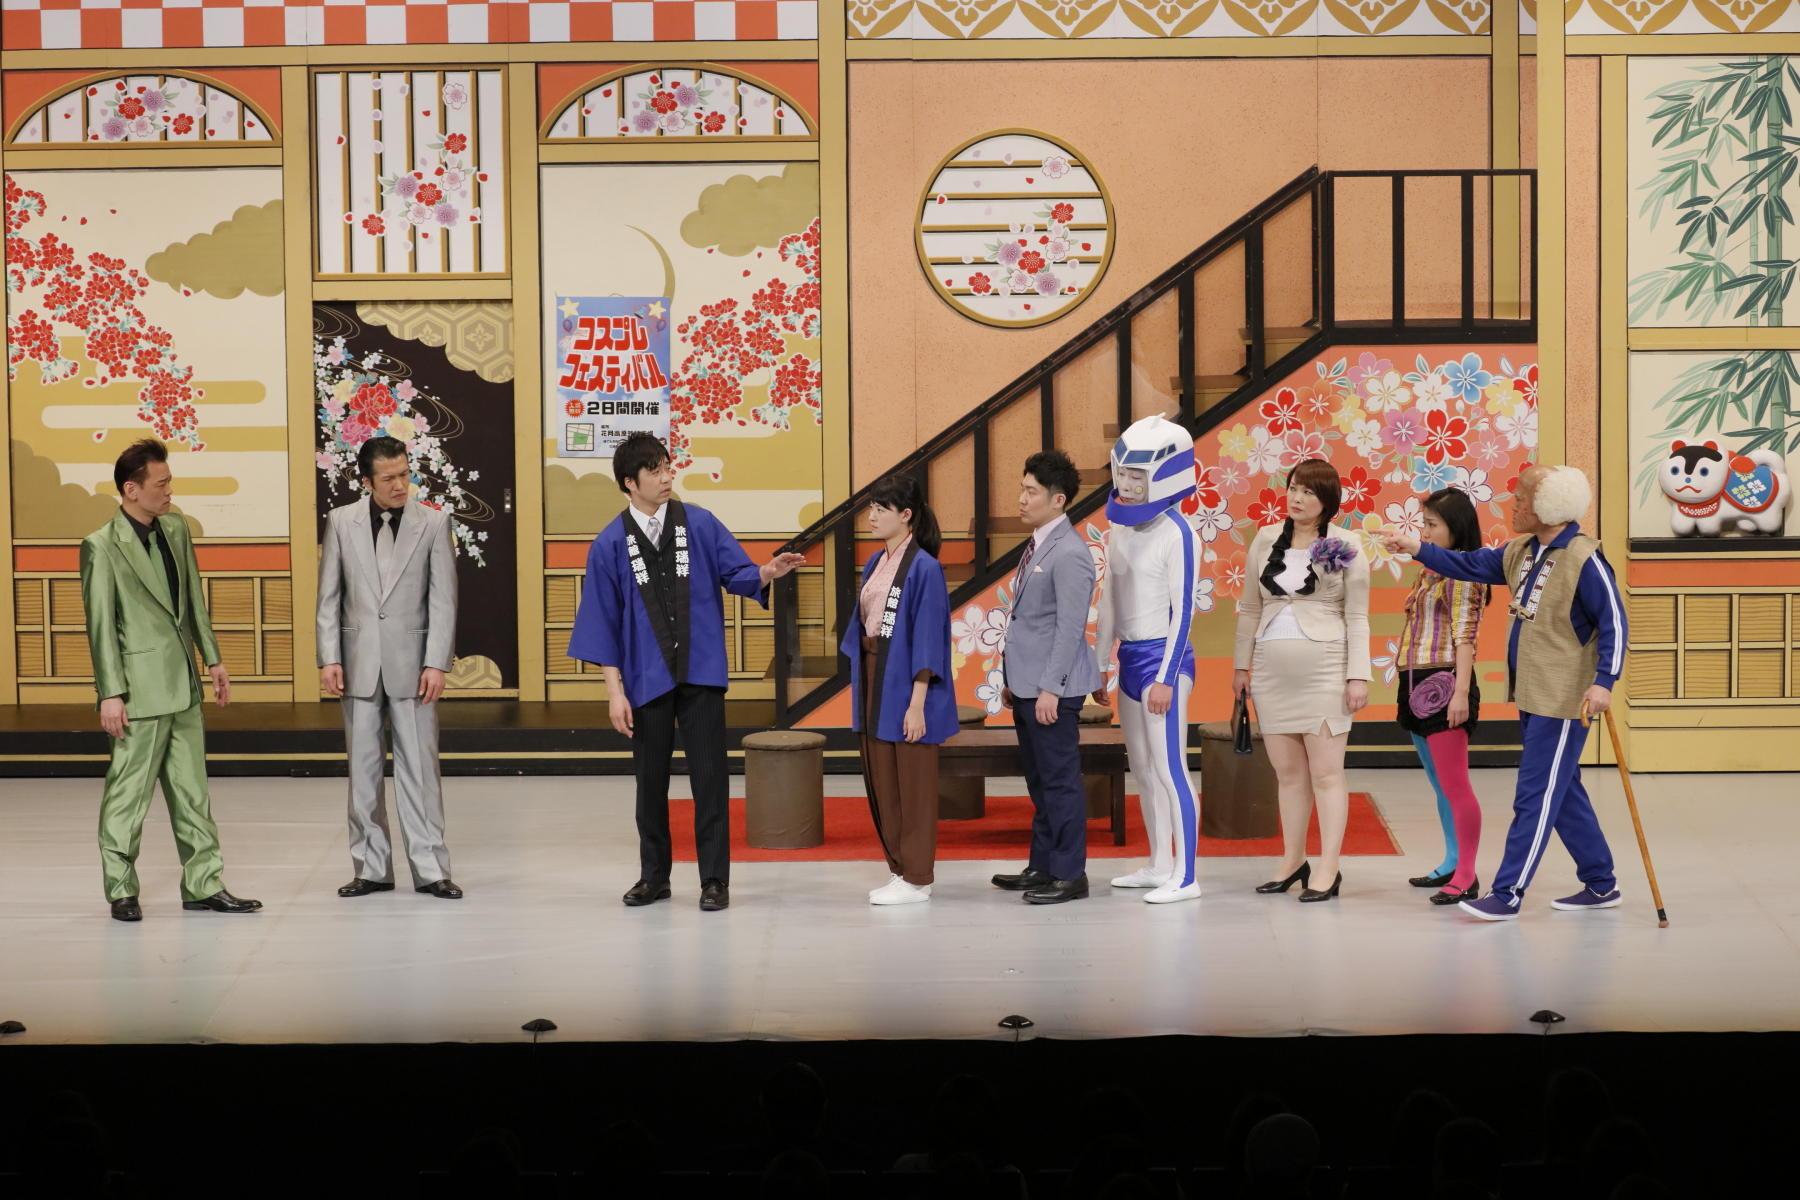 http://news.yoshimoto.co.jp/20180311222741-65727e1bfda003774c2445b72fb6dcb061ec2508.jpg